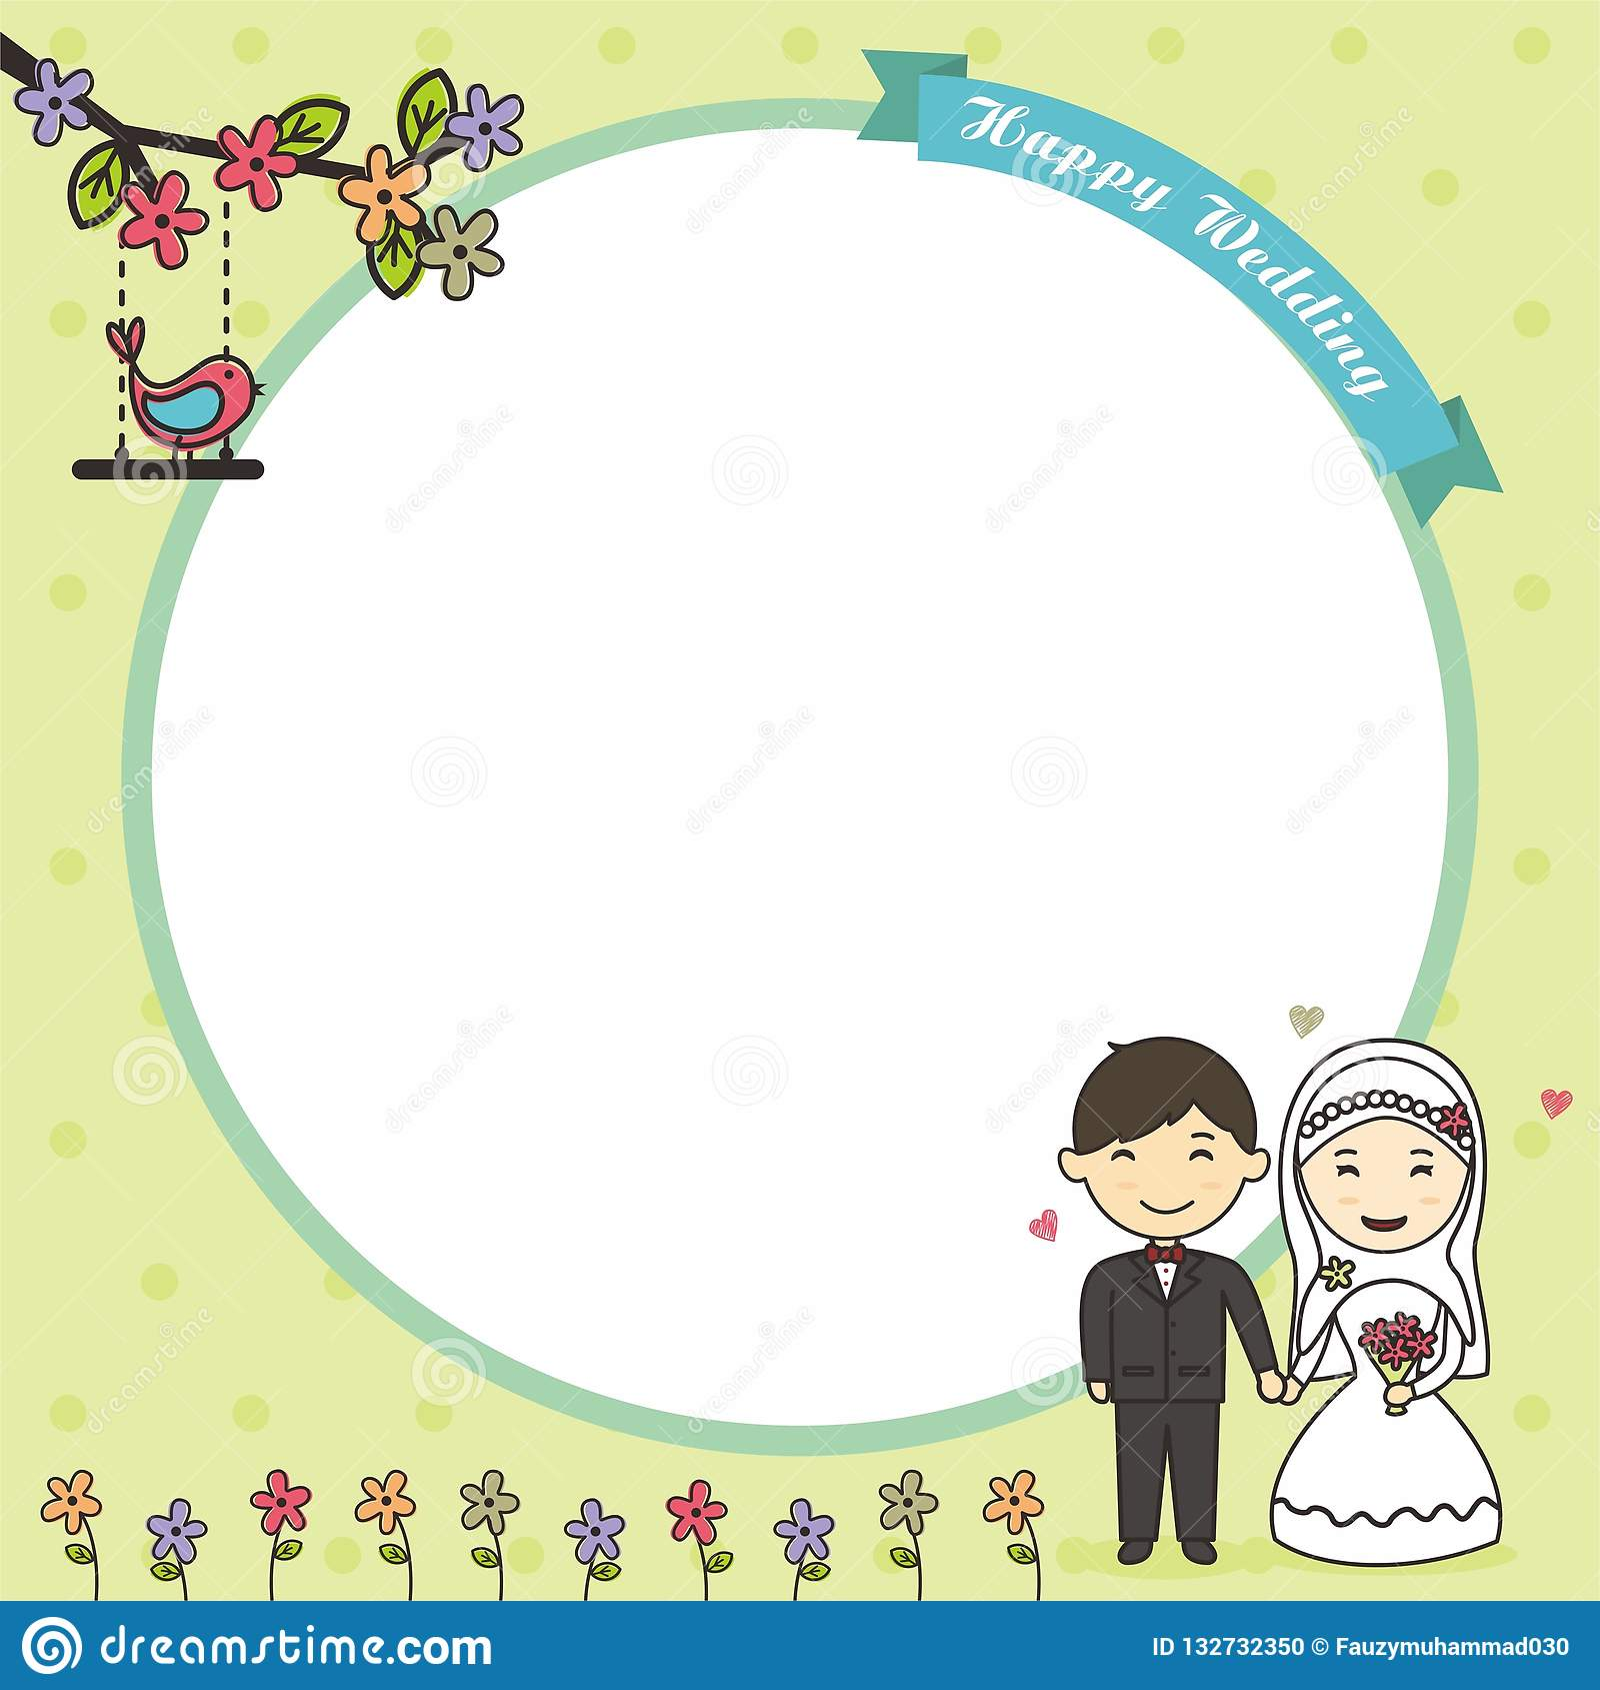 https www dreamstime com green card frame background couple cartoon blank muslim bride groom image132732350